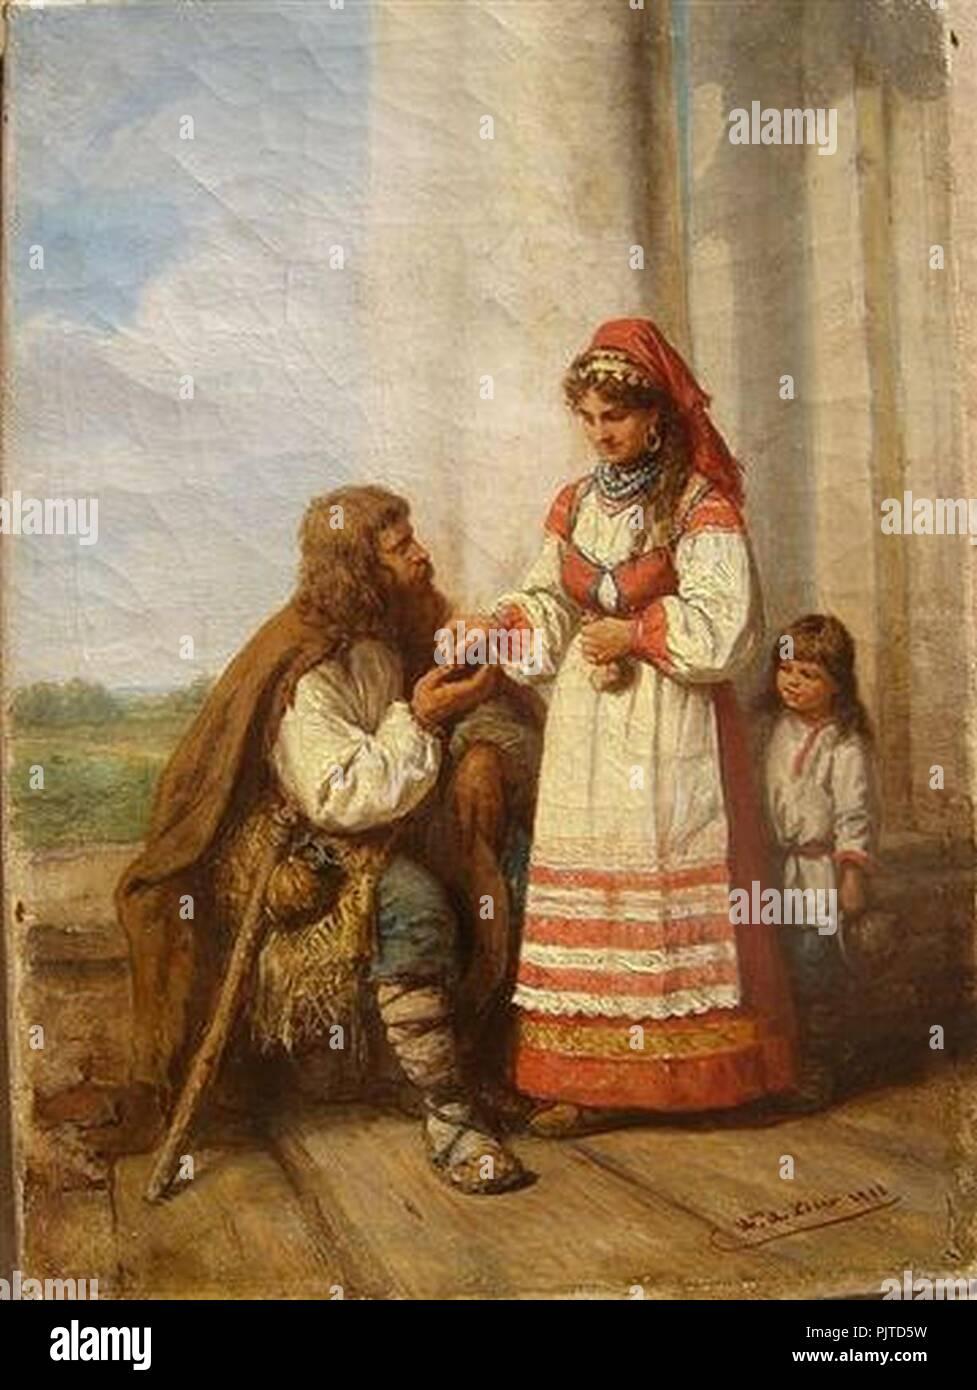 Beer Das Almosen 1883. - Stock Image